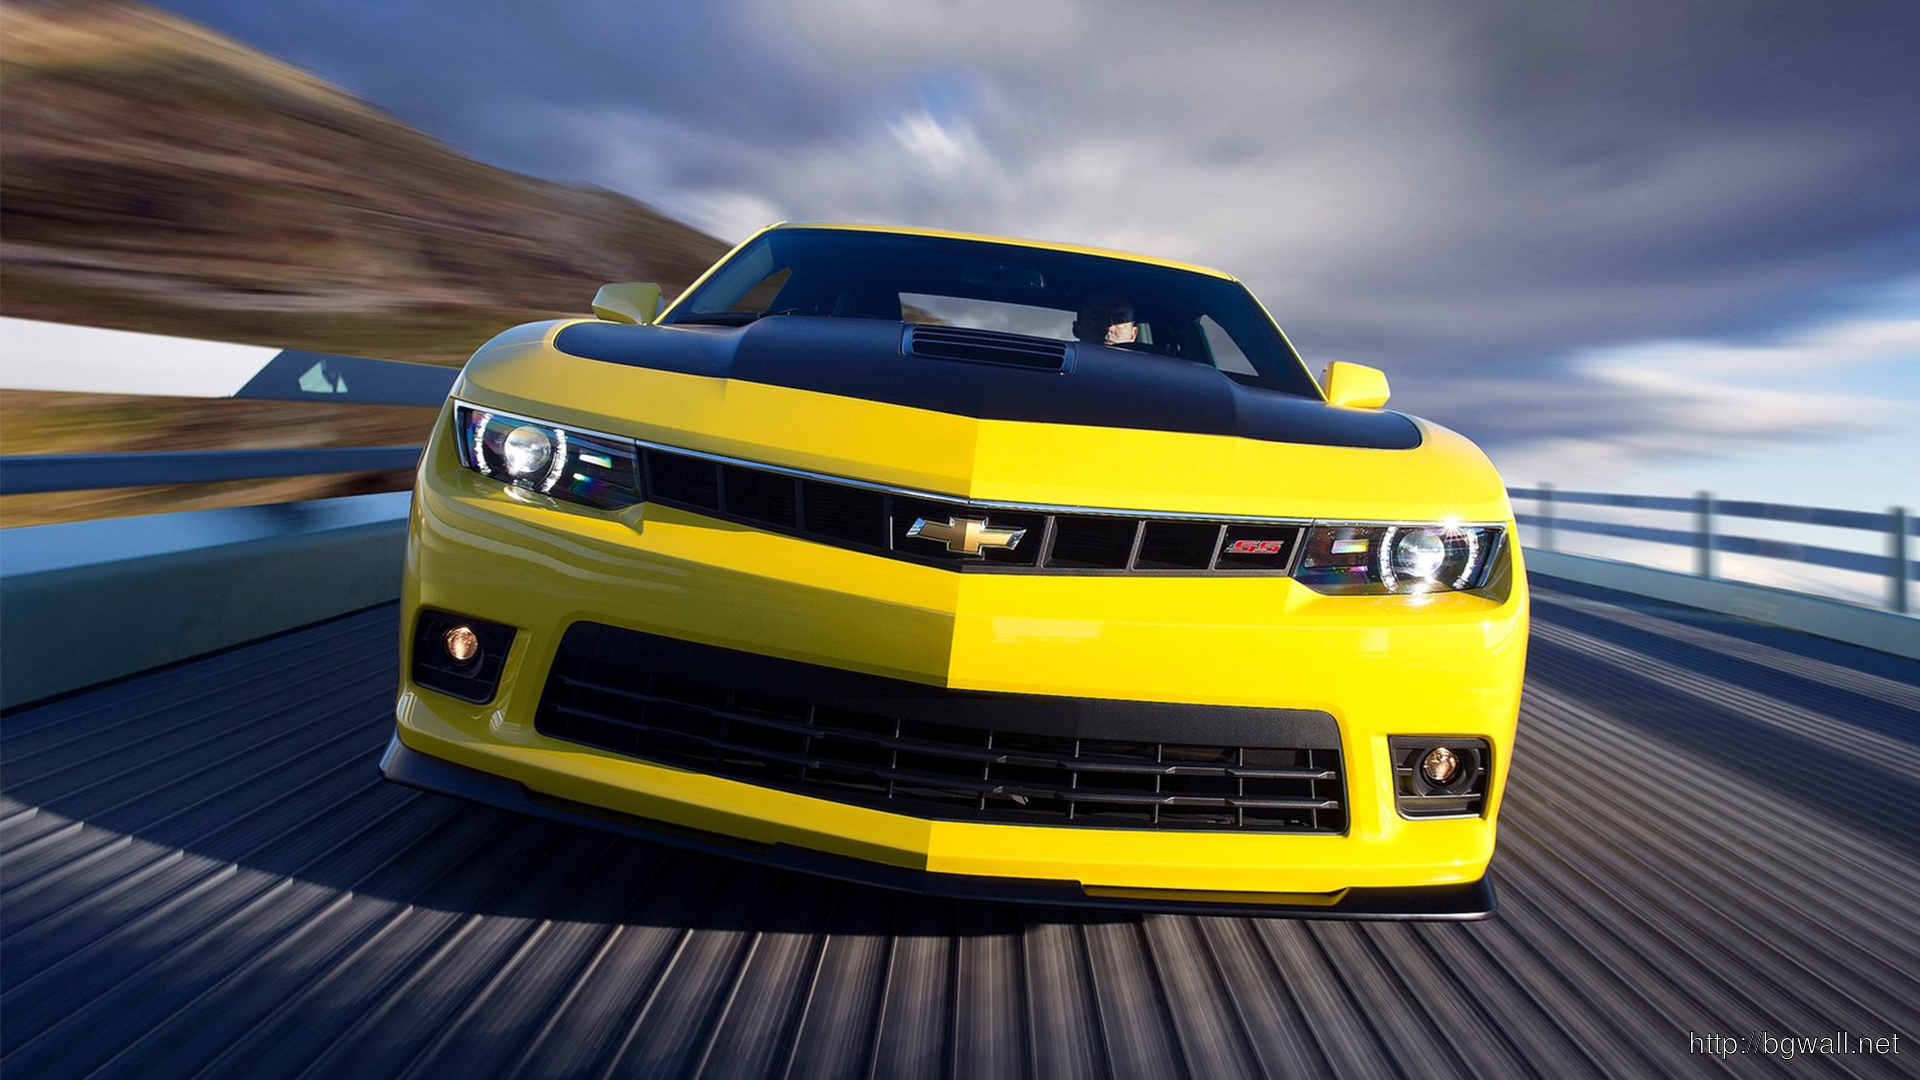 Chevrolet camaro laptop wallpaper background wallpaper hd - Most popular hd wallpapers 1080p ...